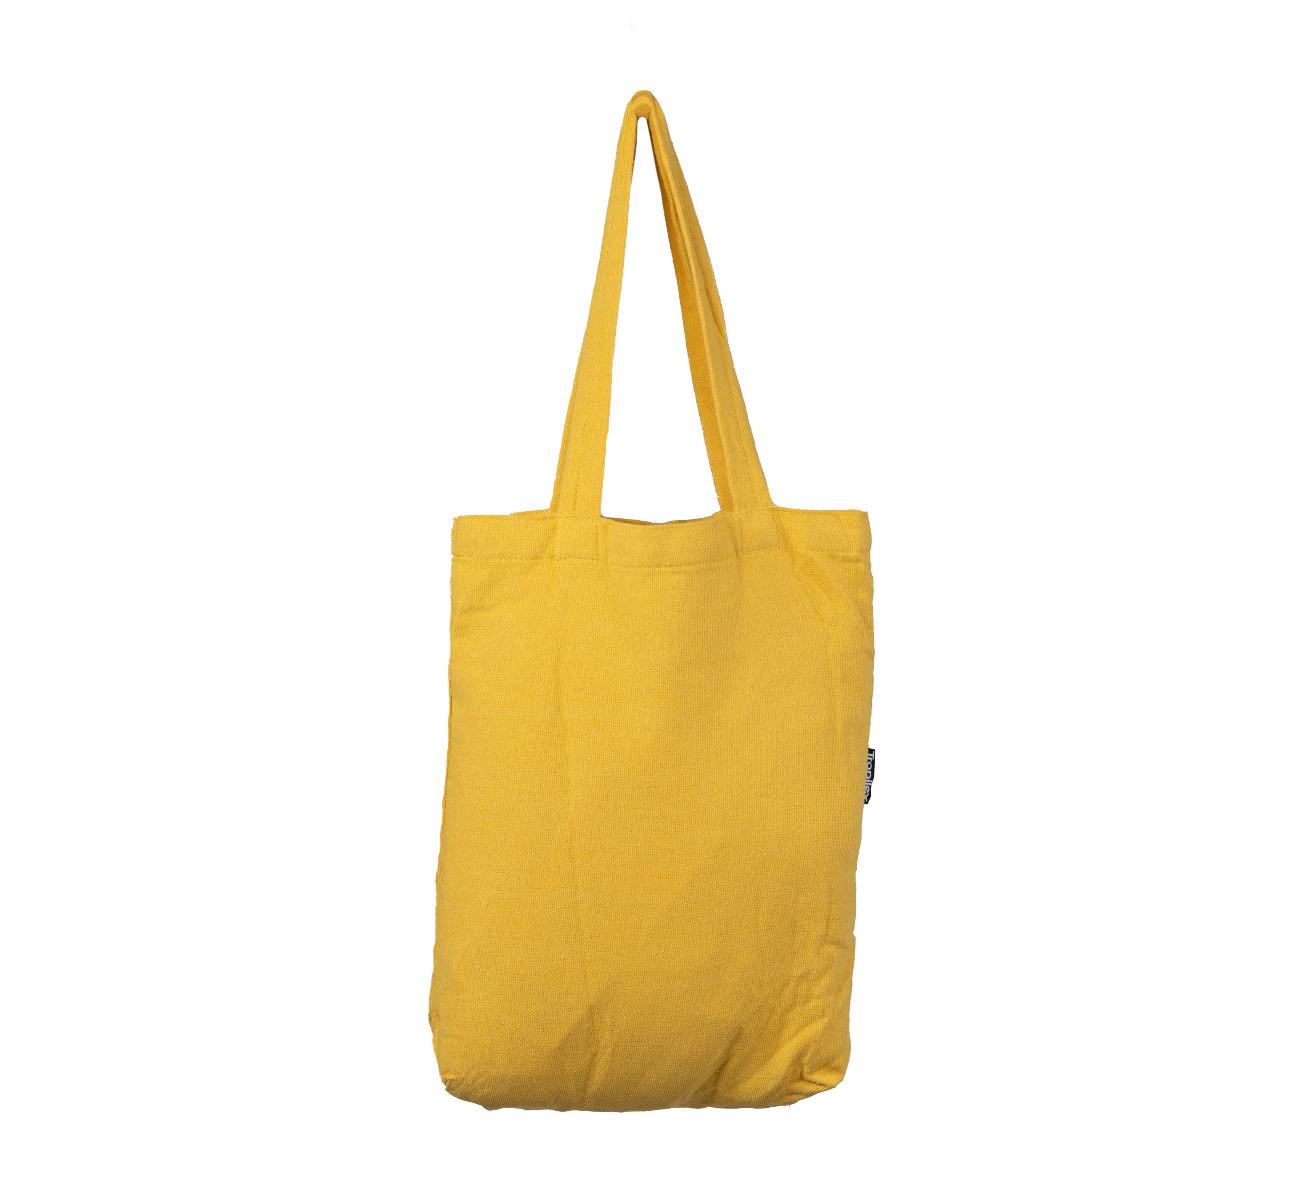 Hangmat 'Fine' Yellow - Tropilex �